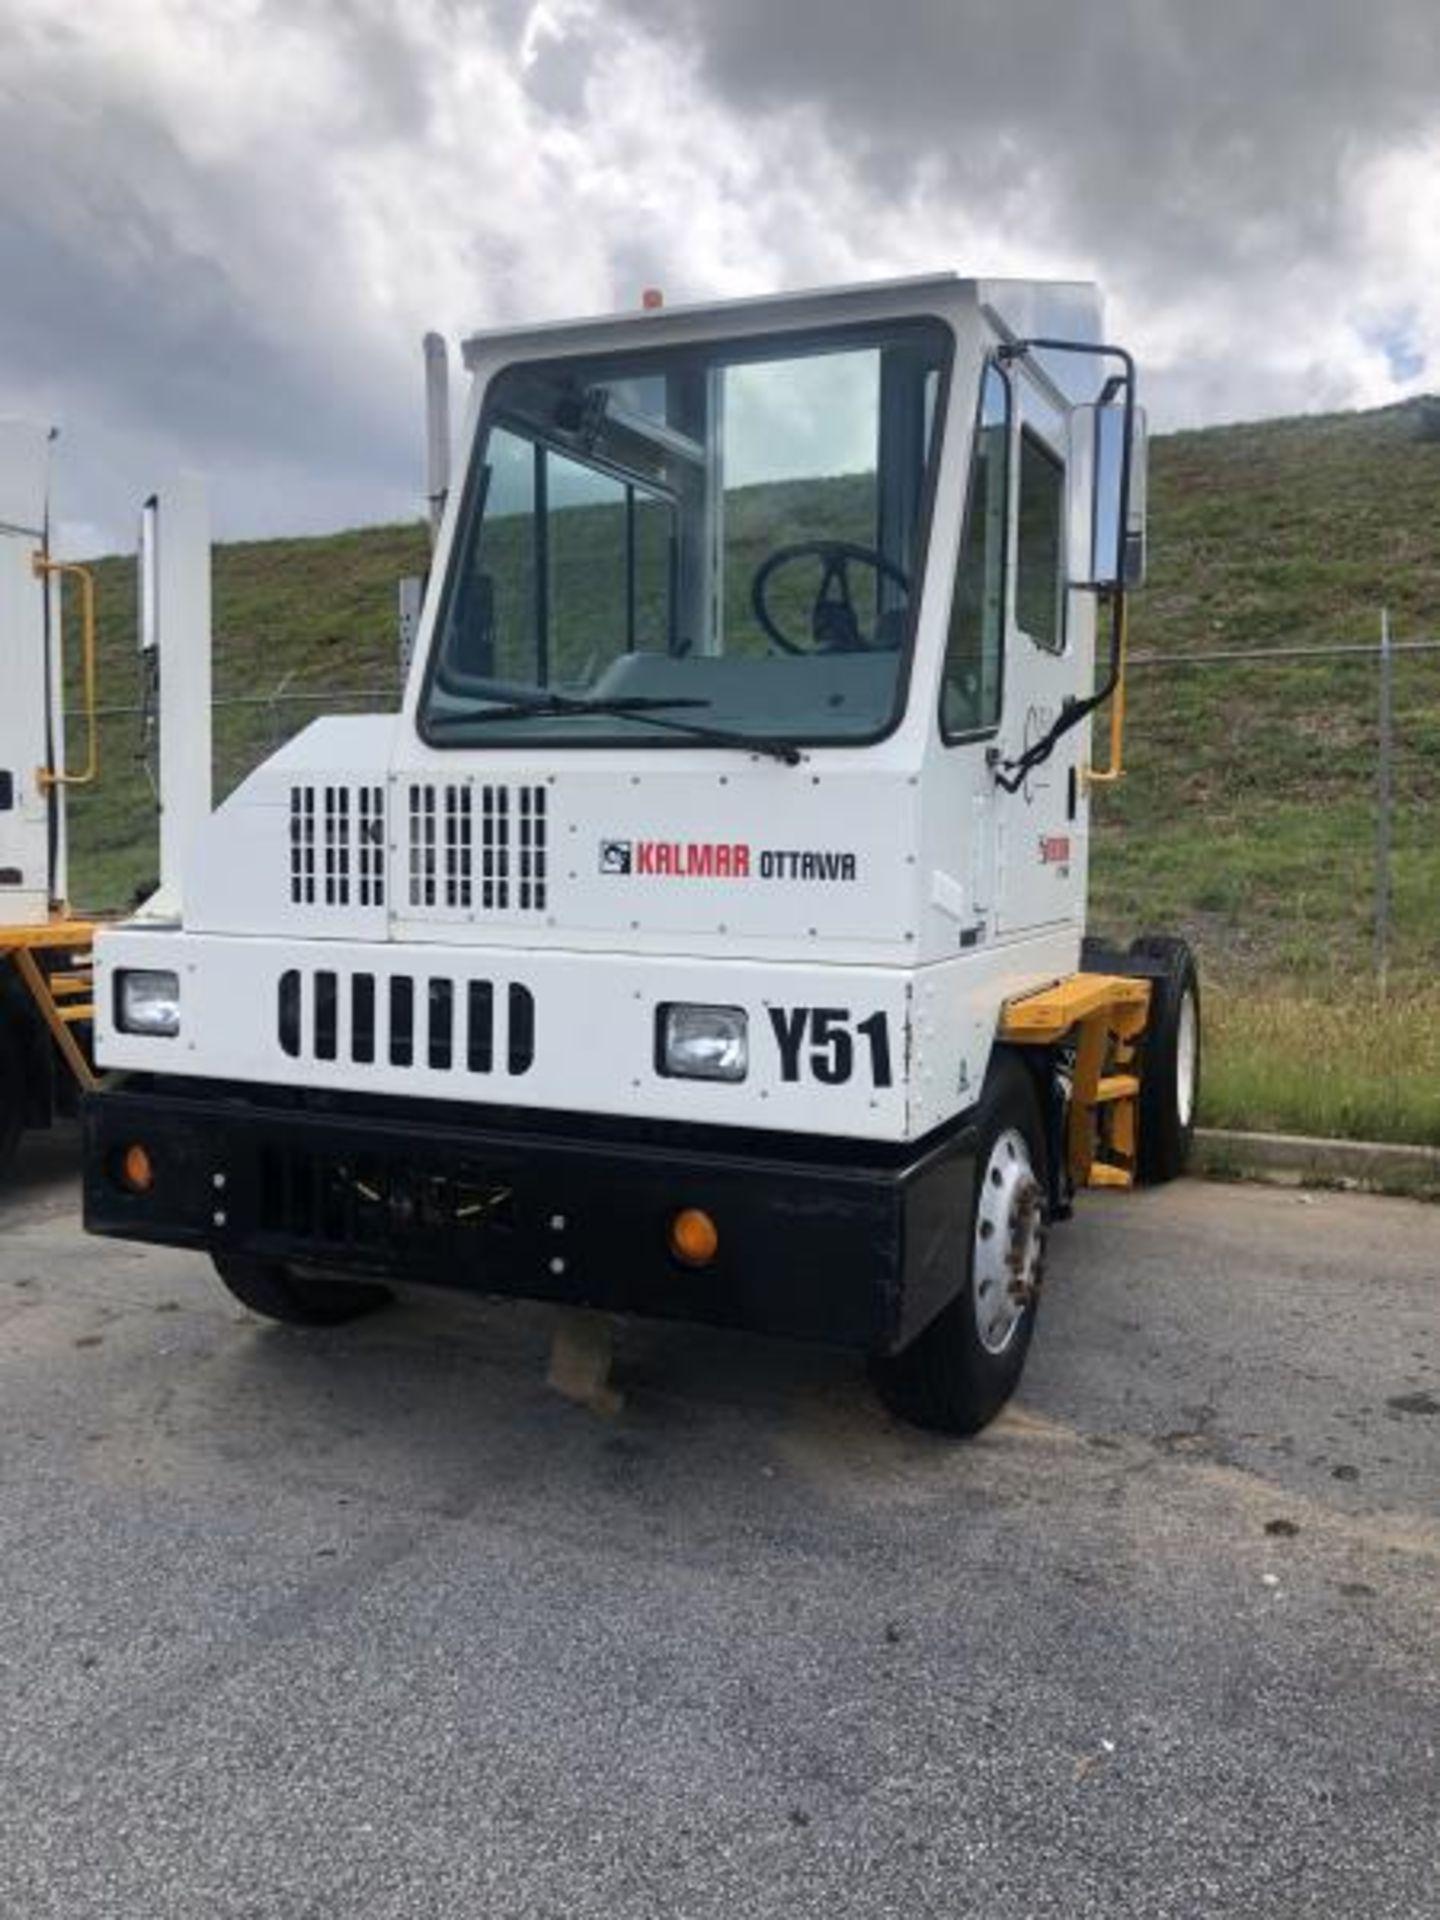 2015 Kalmar Ottawa 4x2 Yard Truck , SN: 338845 2,600.5 Hours, 185 Miles